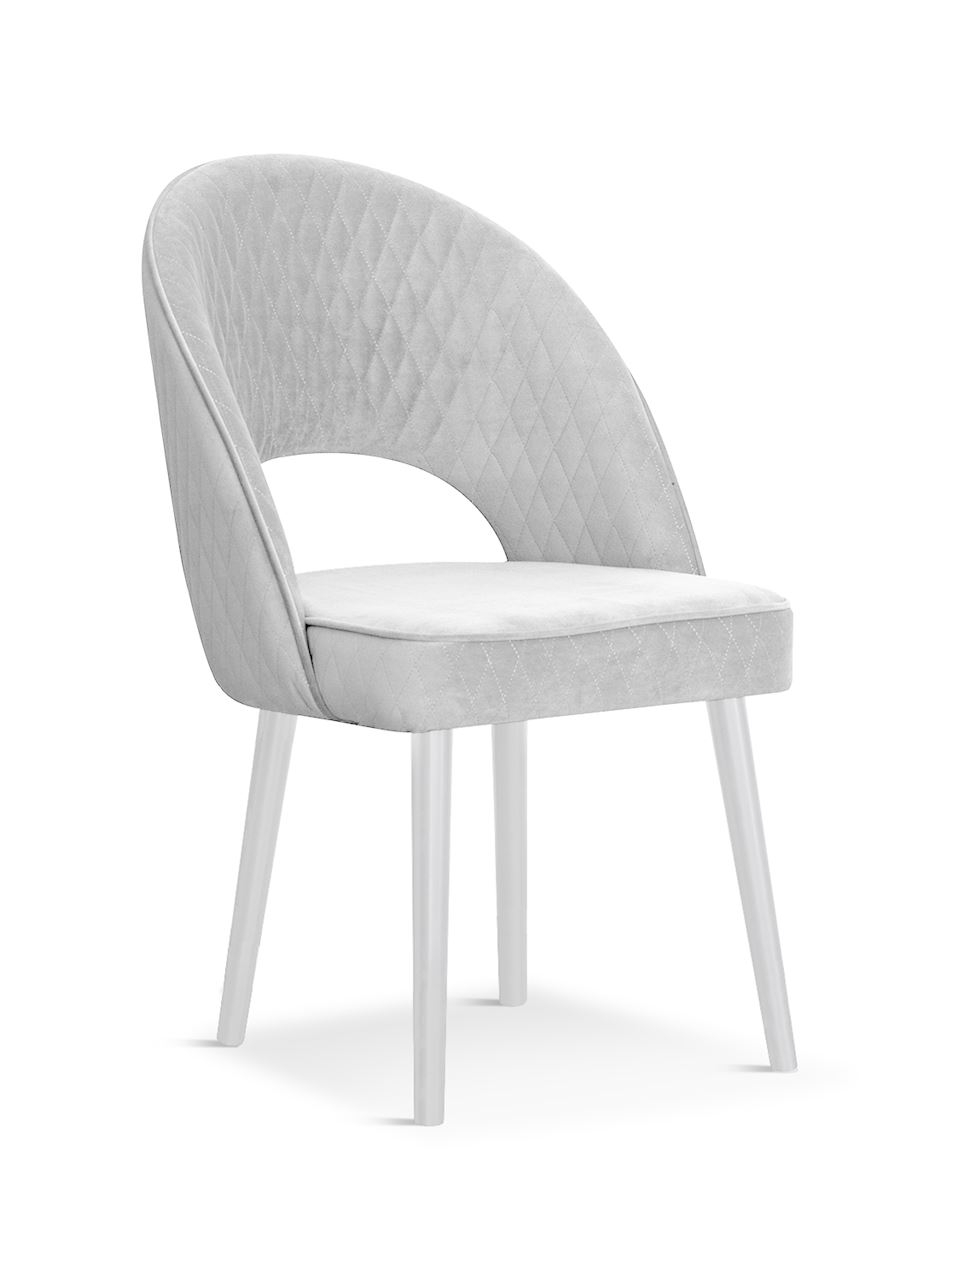 Scaun tapitat cu stofa, cu picioare din lemn Ponte Silver / White, l56xA63xH89 cm